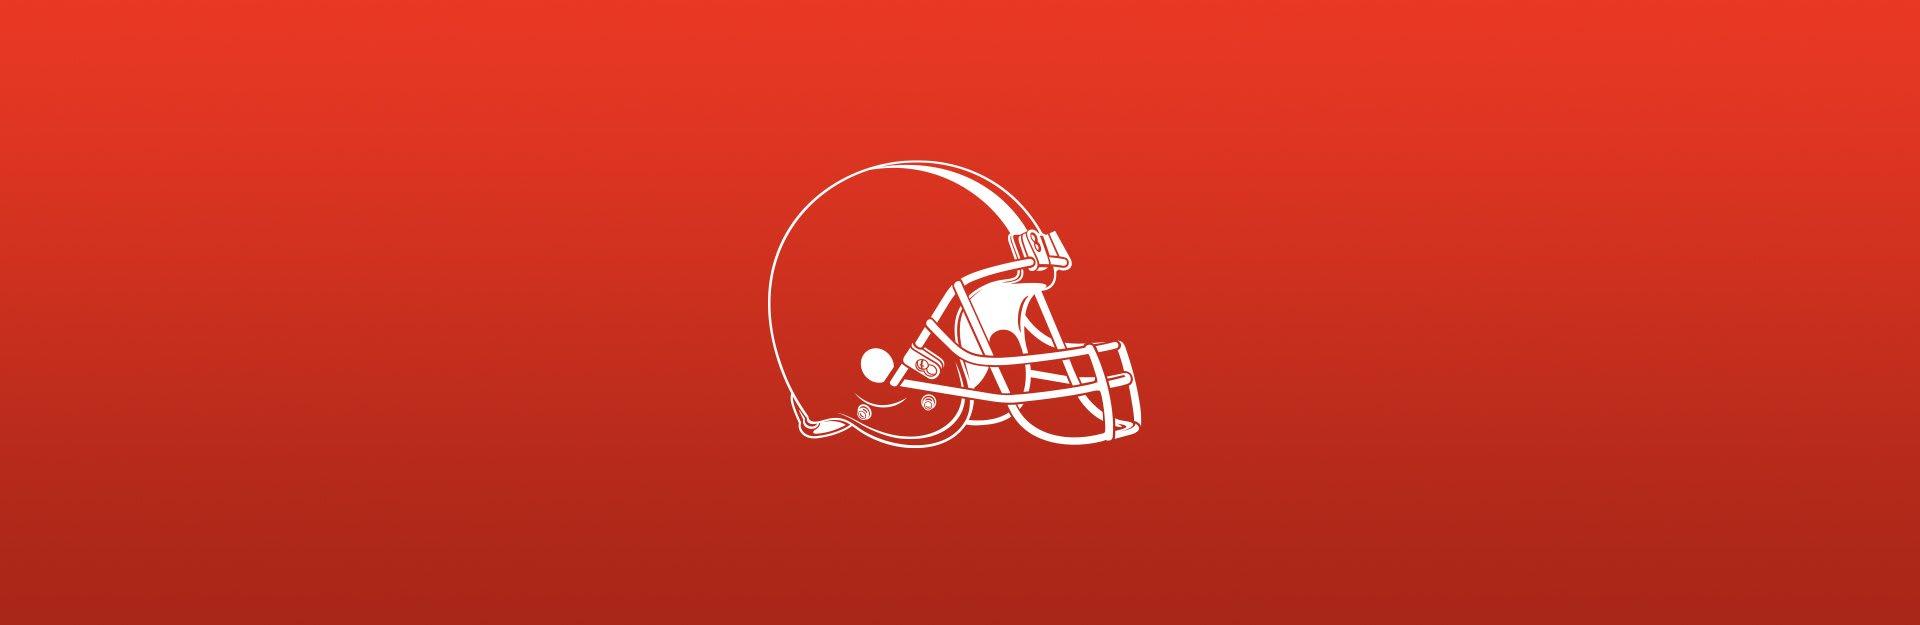 Cleveland Browns background on orange background